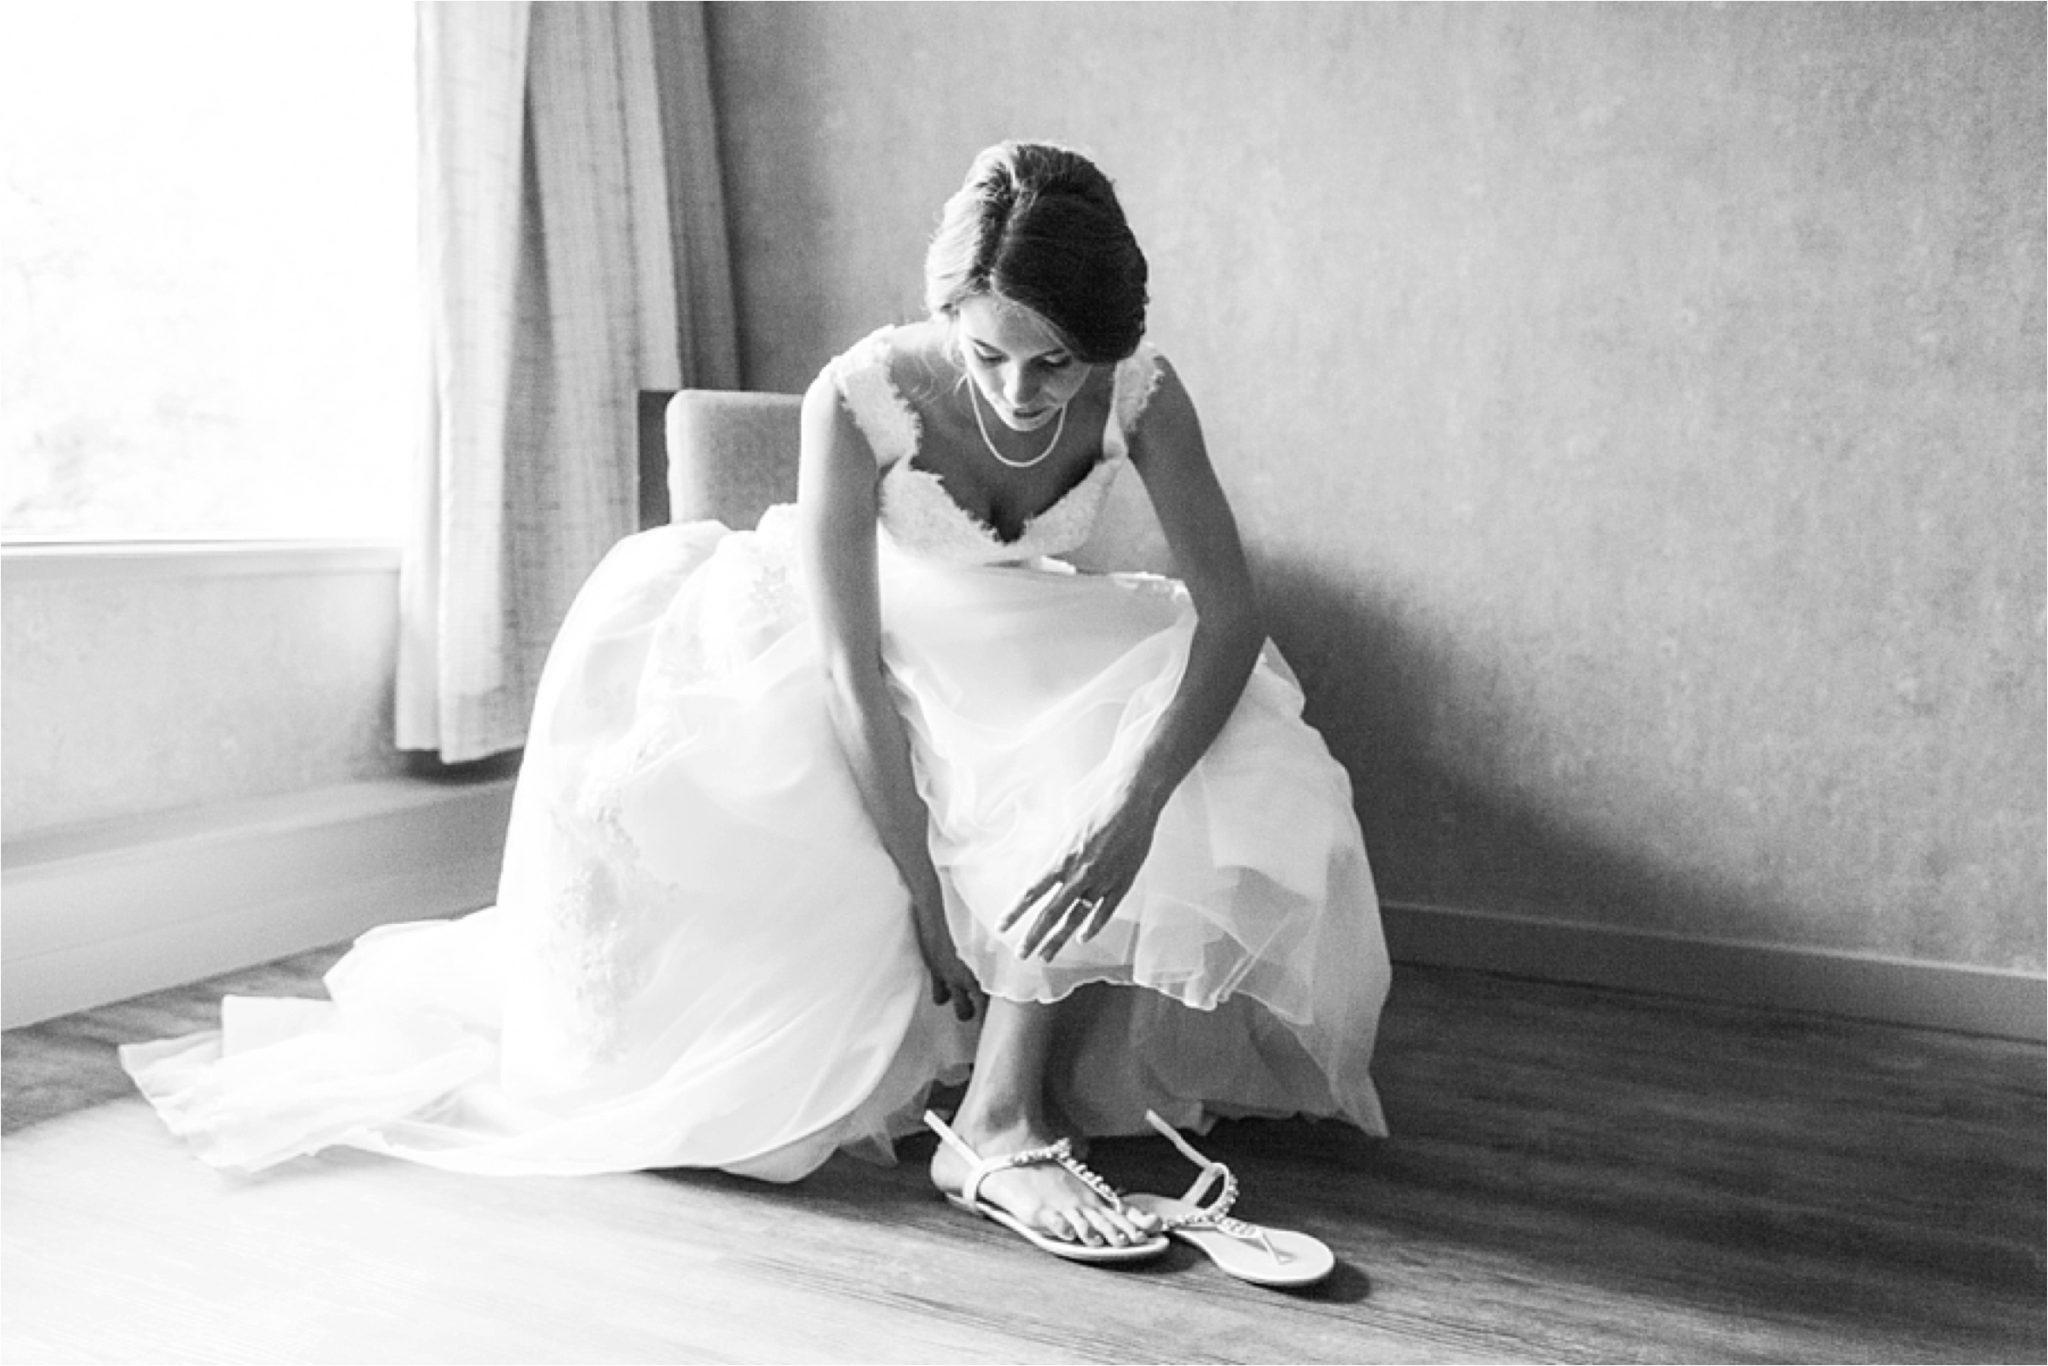 Kananaskis Canada Wedding at the Delta Lodge-Kaitlin & Ricky-Alabama wedding photographer-Lodge wedding-Bridal photography-Wedding shoes